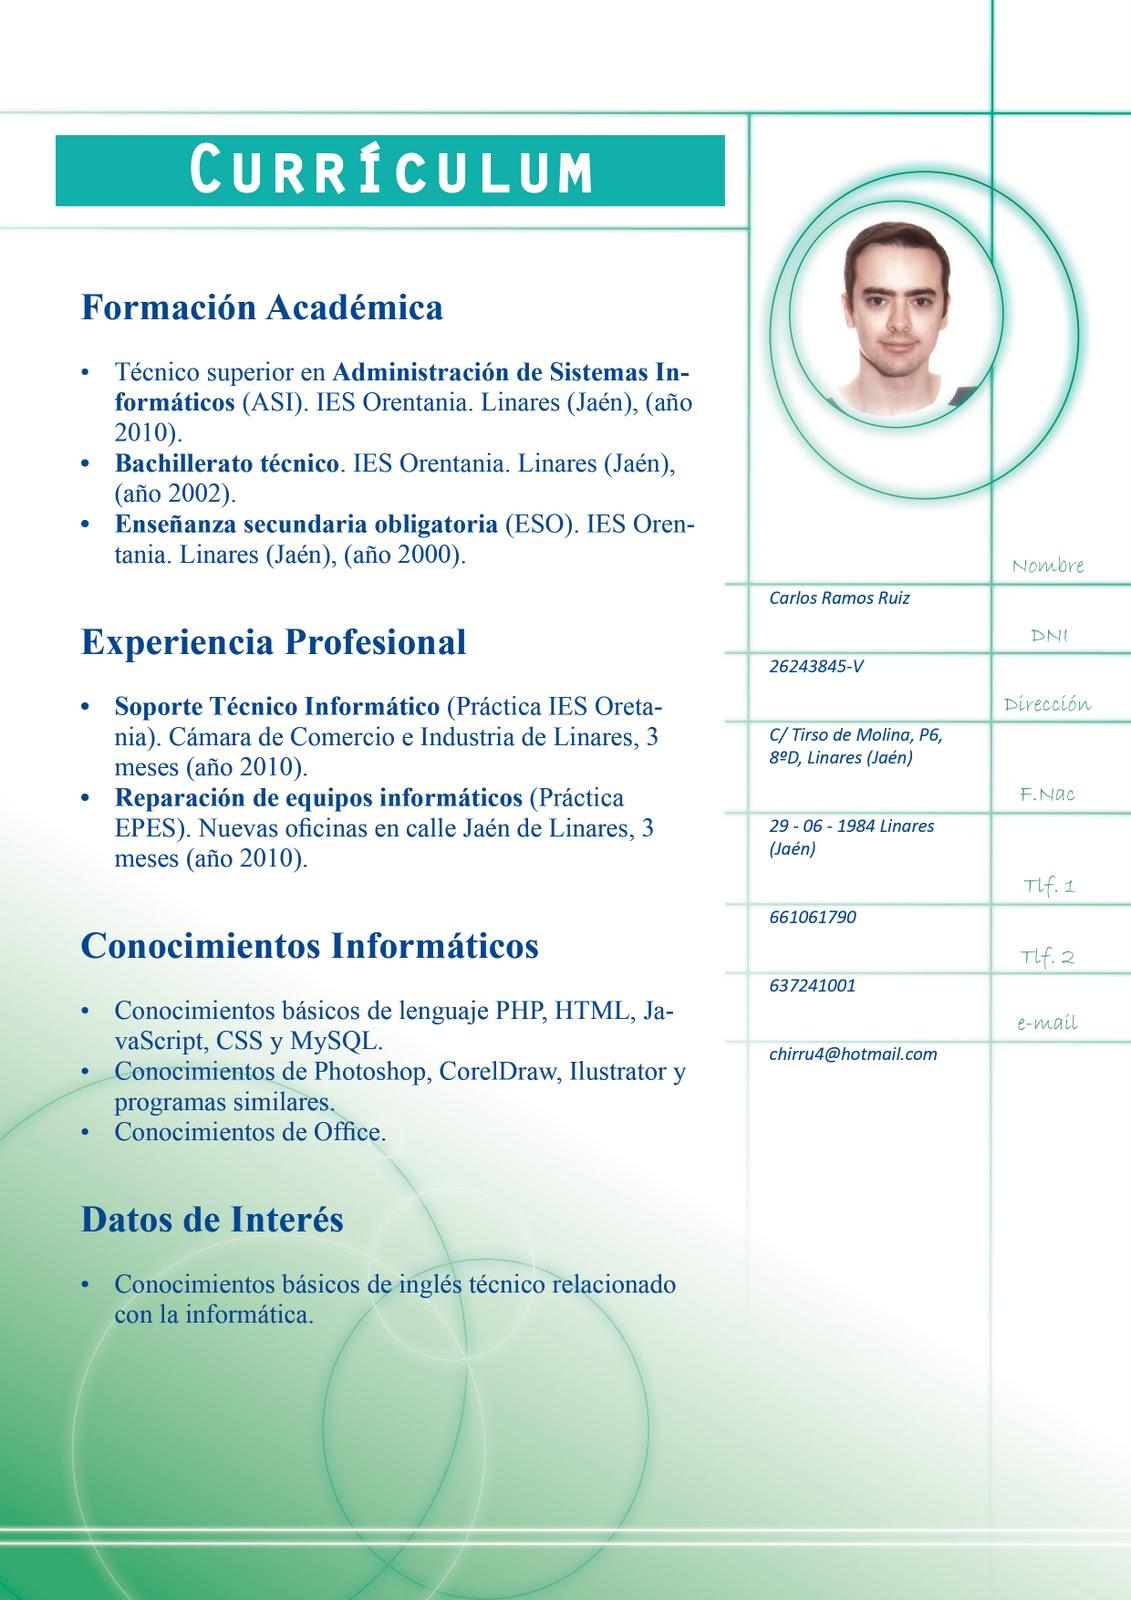 4-carlosdisenografico: InDesign - Ejercicio 07 - Currículum